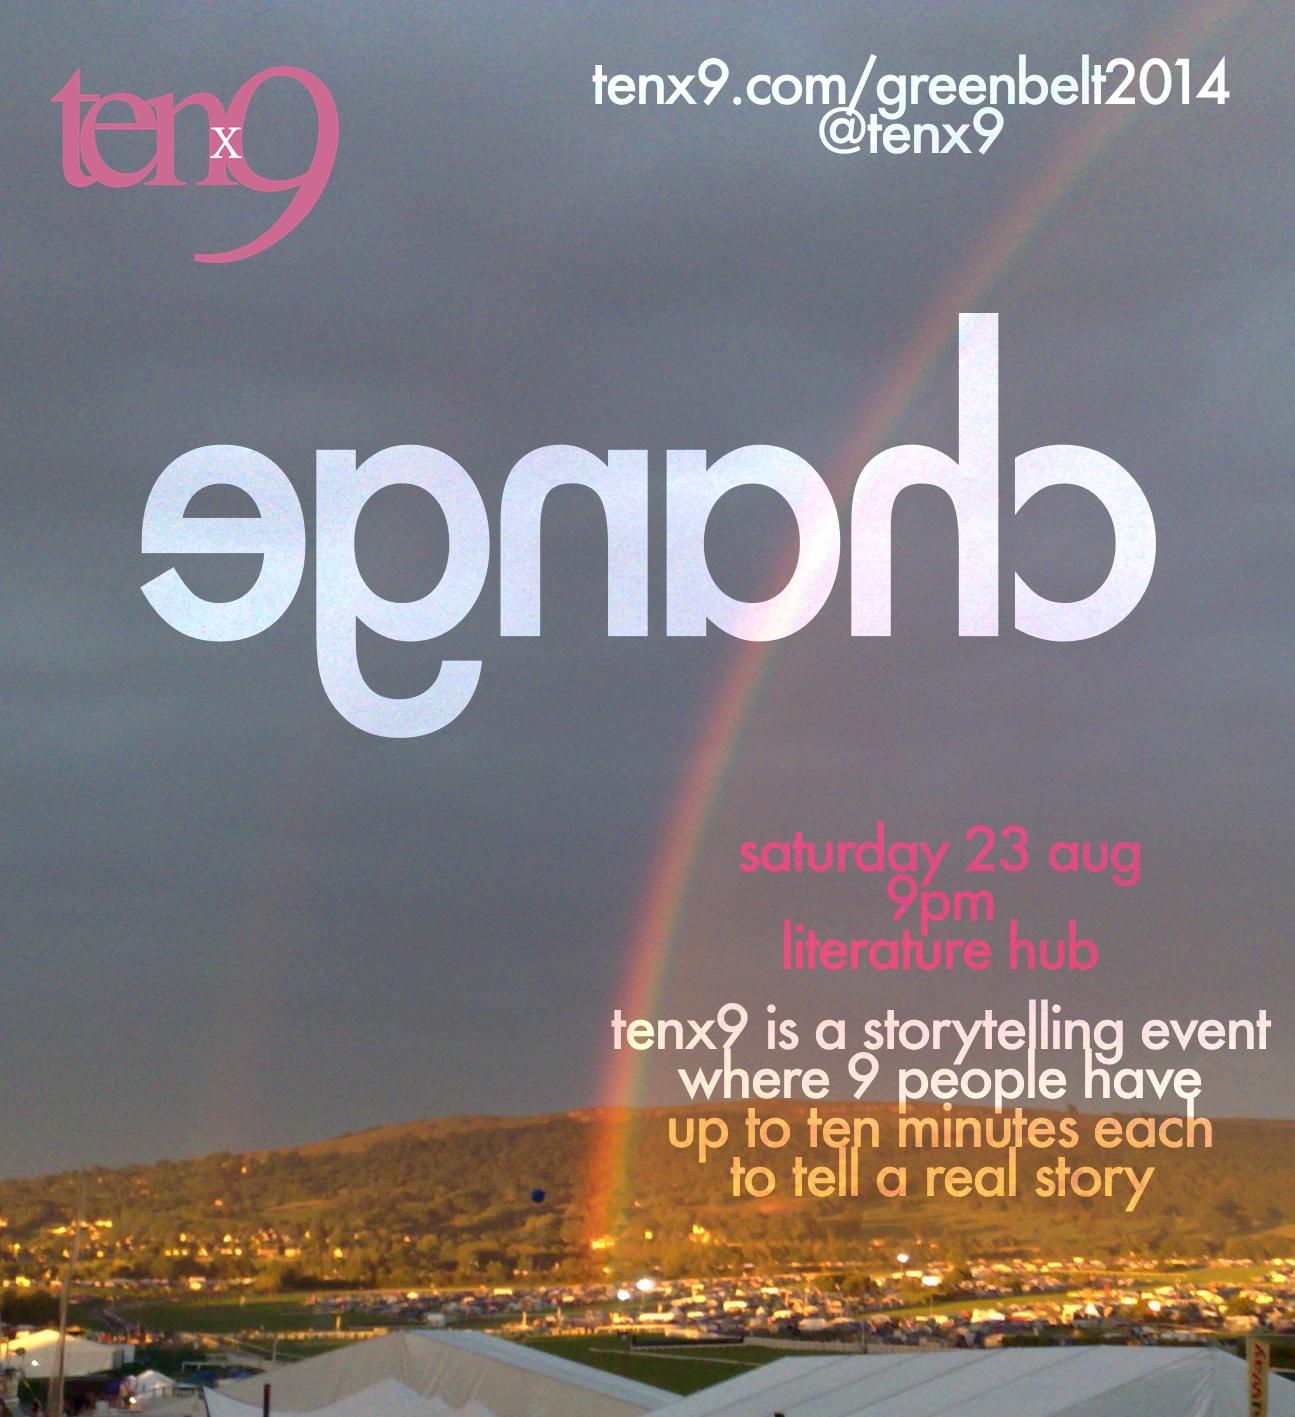 tenx9gb2014 change.jpg